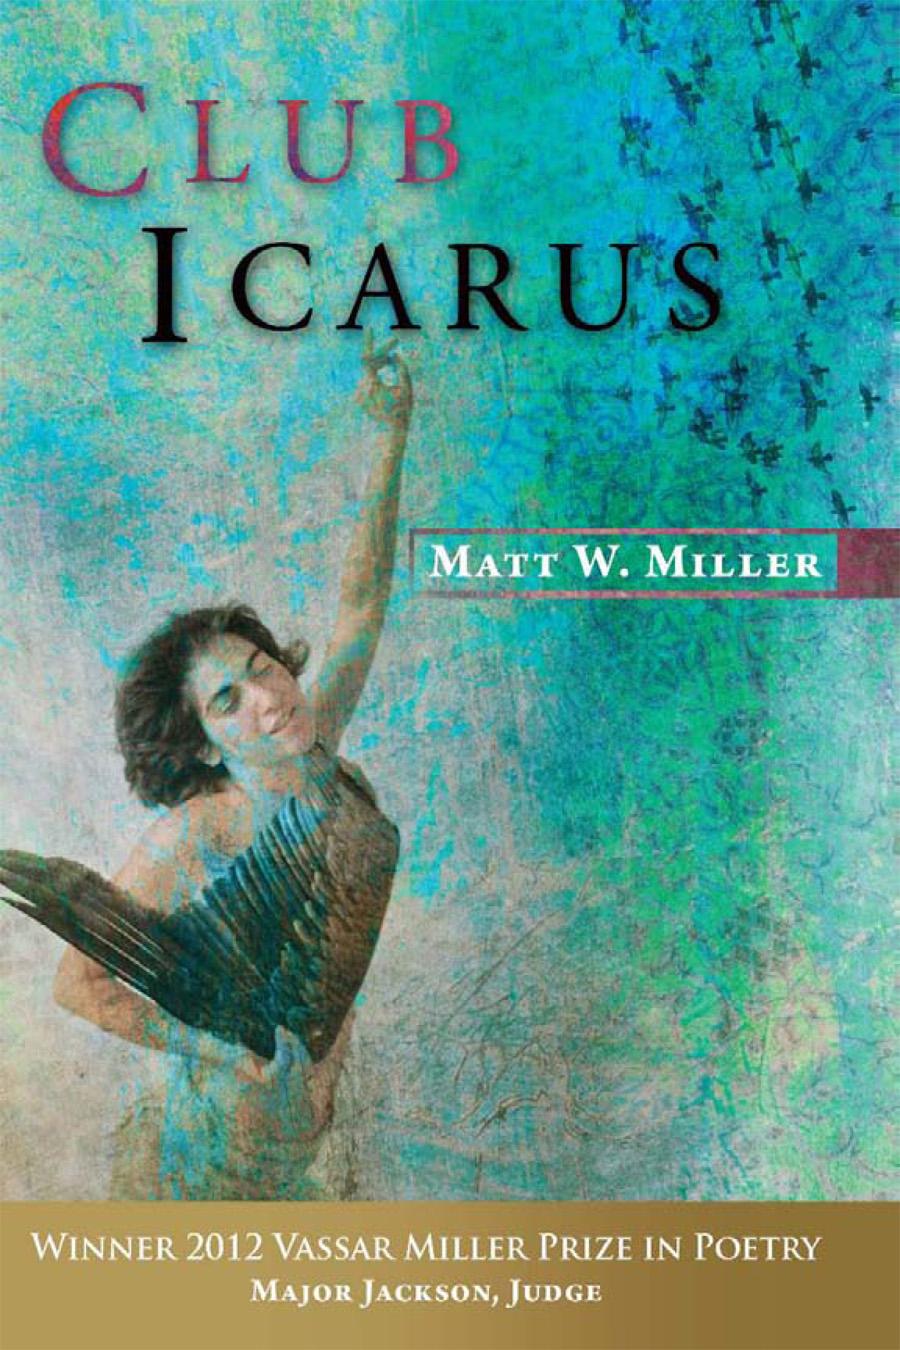 Club Icarus.jpg